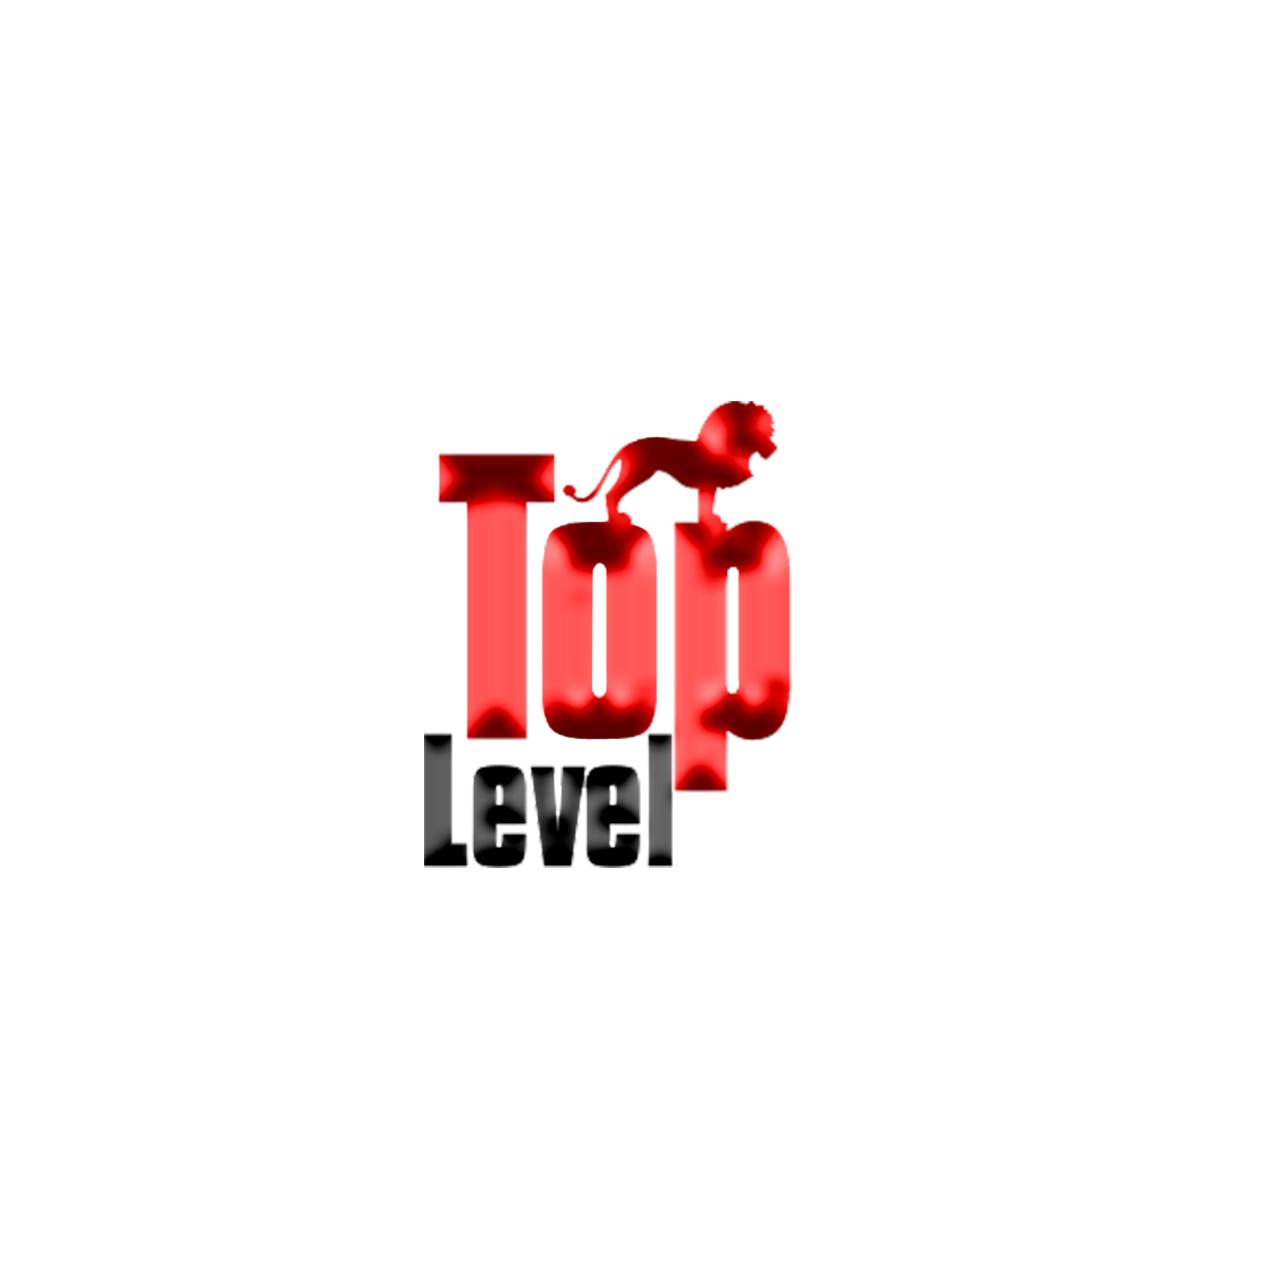 Разработка логотипа для тюнинг ателье фото f_3795f3166b197980.png